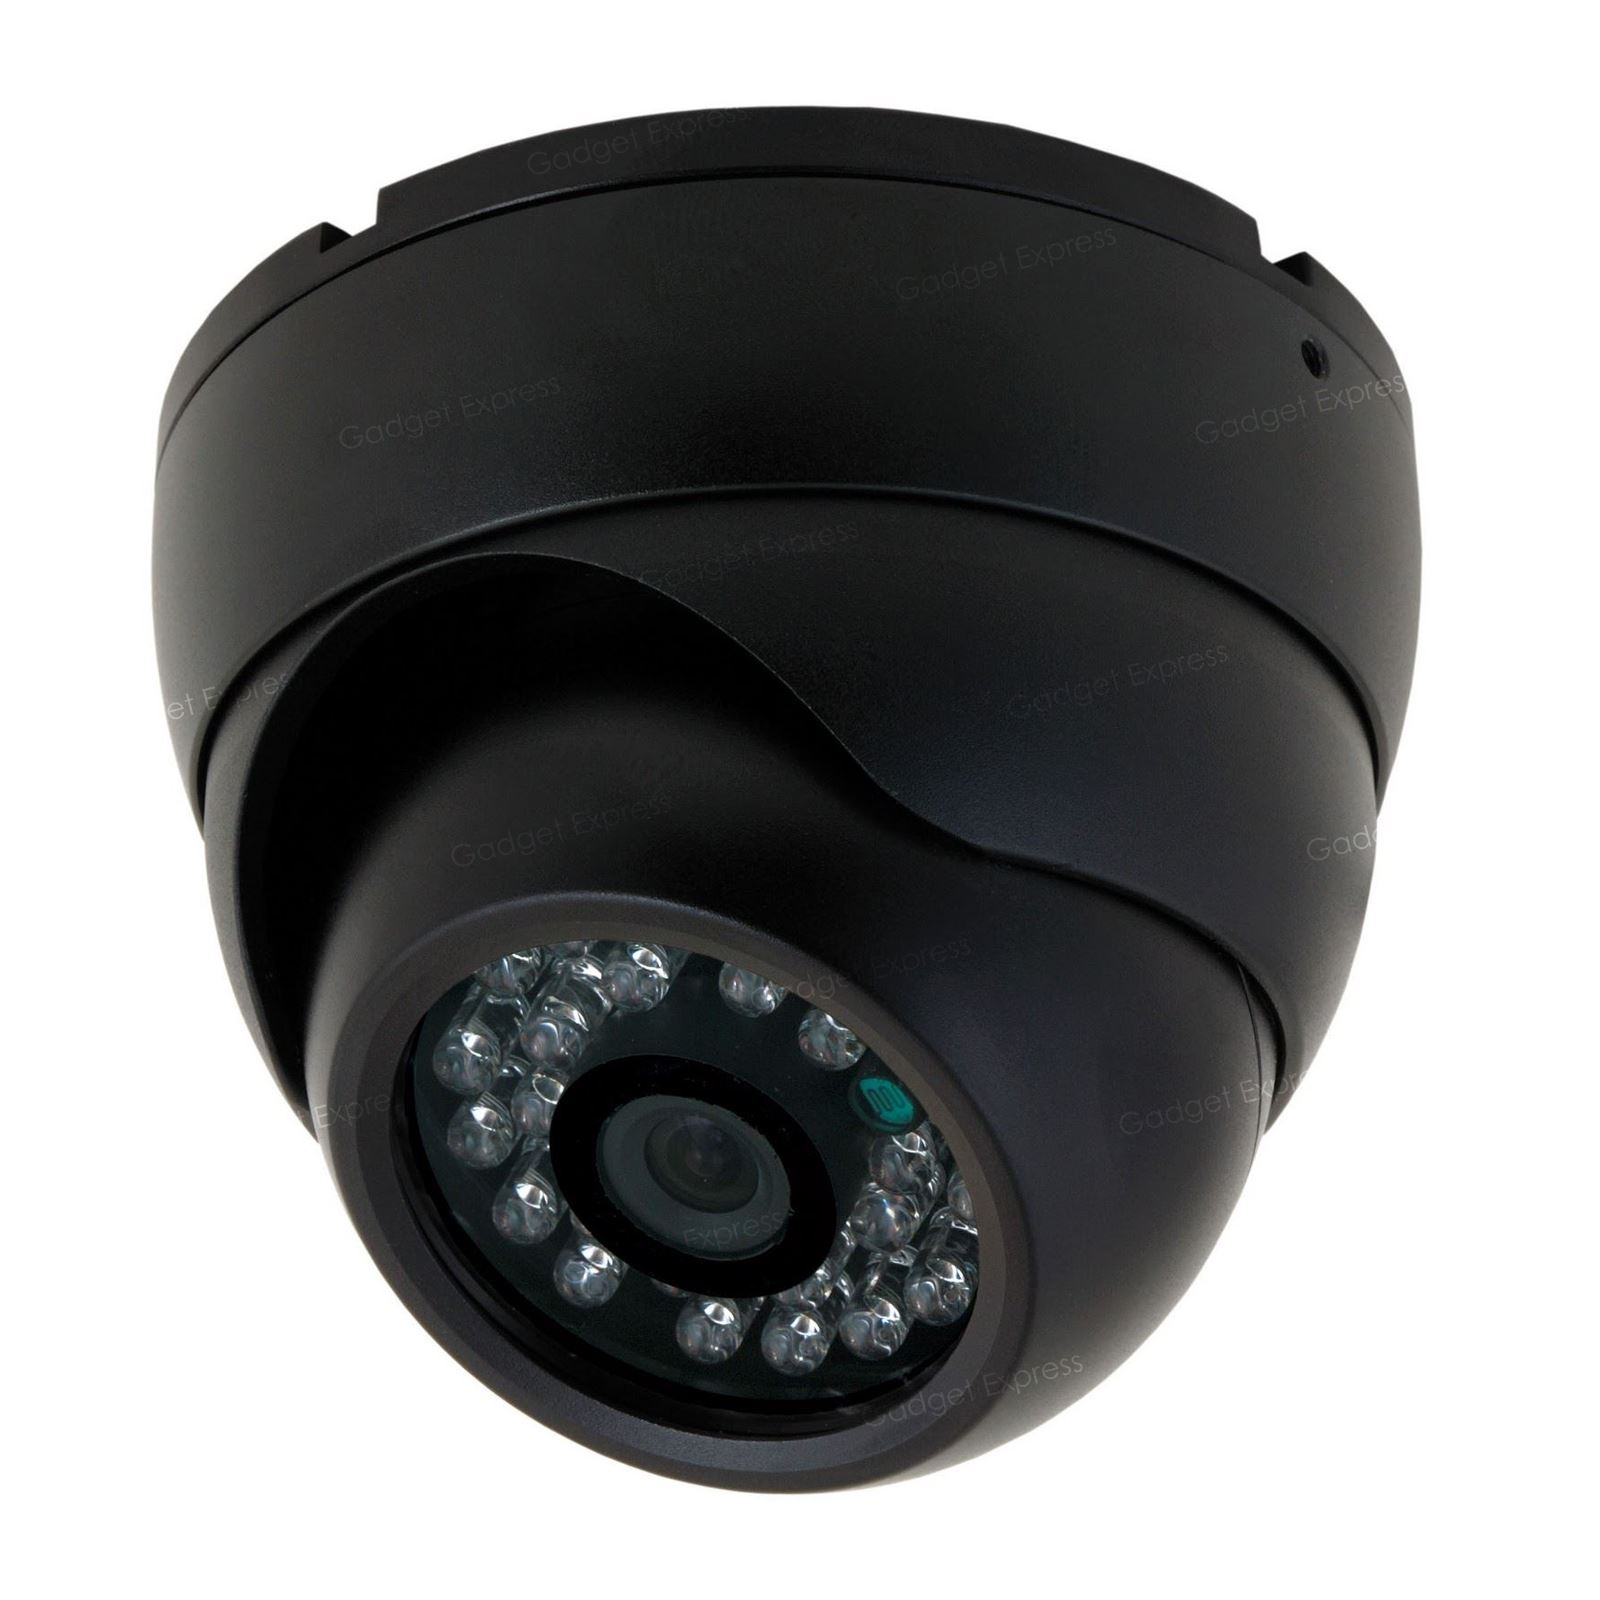 "Indoor Outdoor 700TVL 1/3"" Sony CCD Night IR 3.6mm Dome ..."